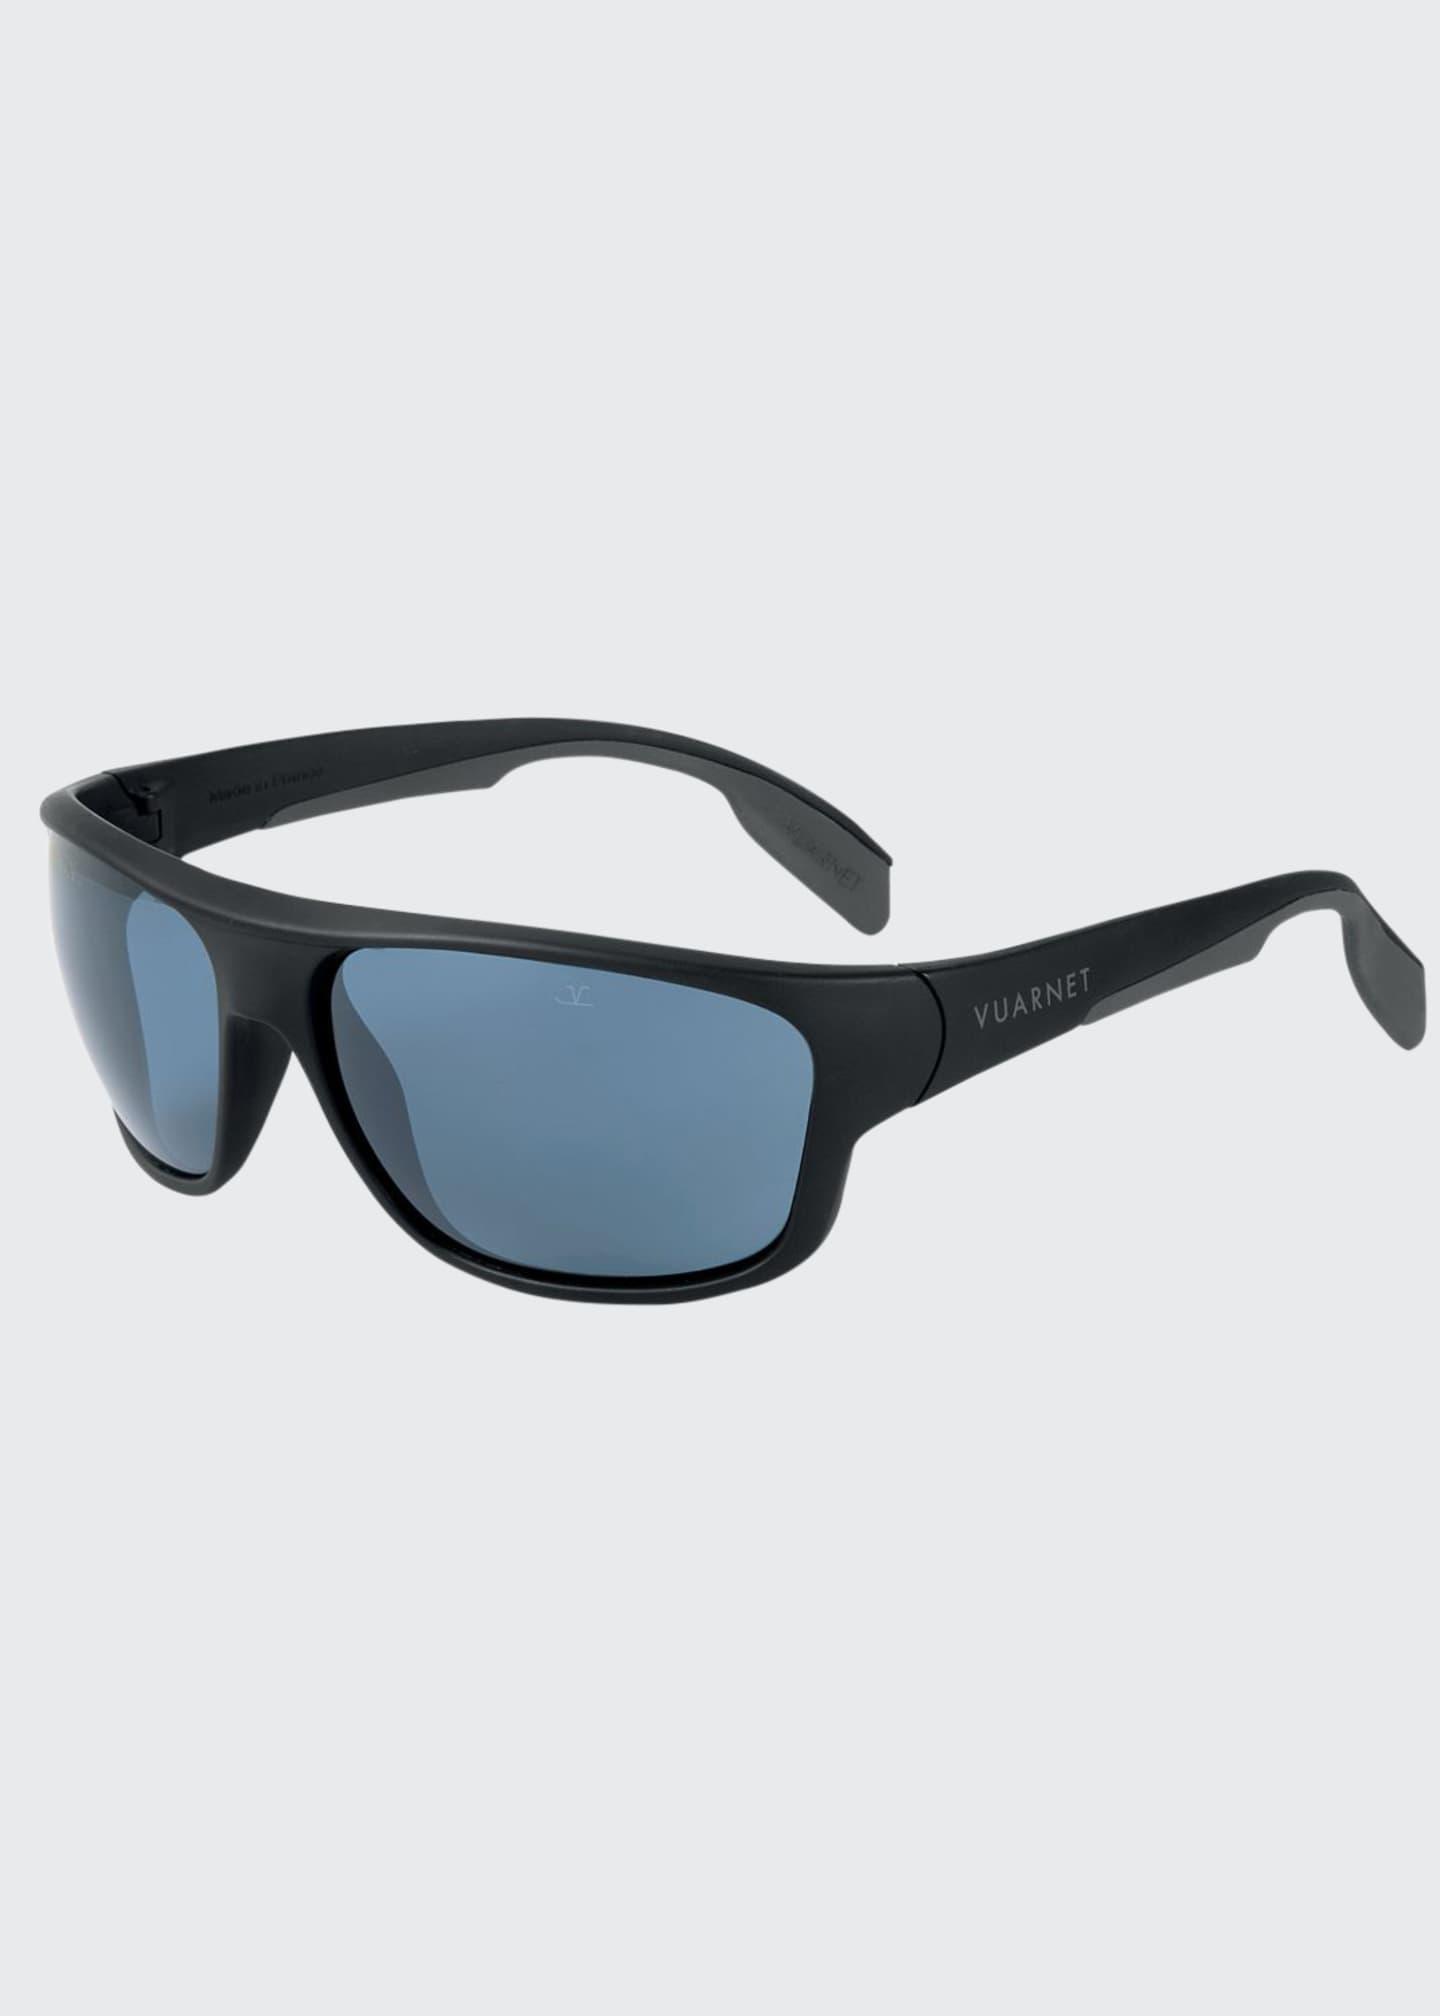 Vuarnet Men's Active Racing Large Nylon Wrap Sunglasses